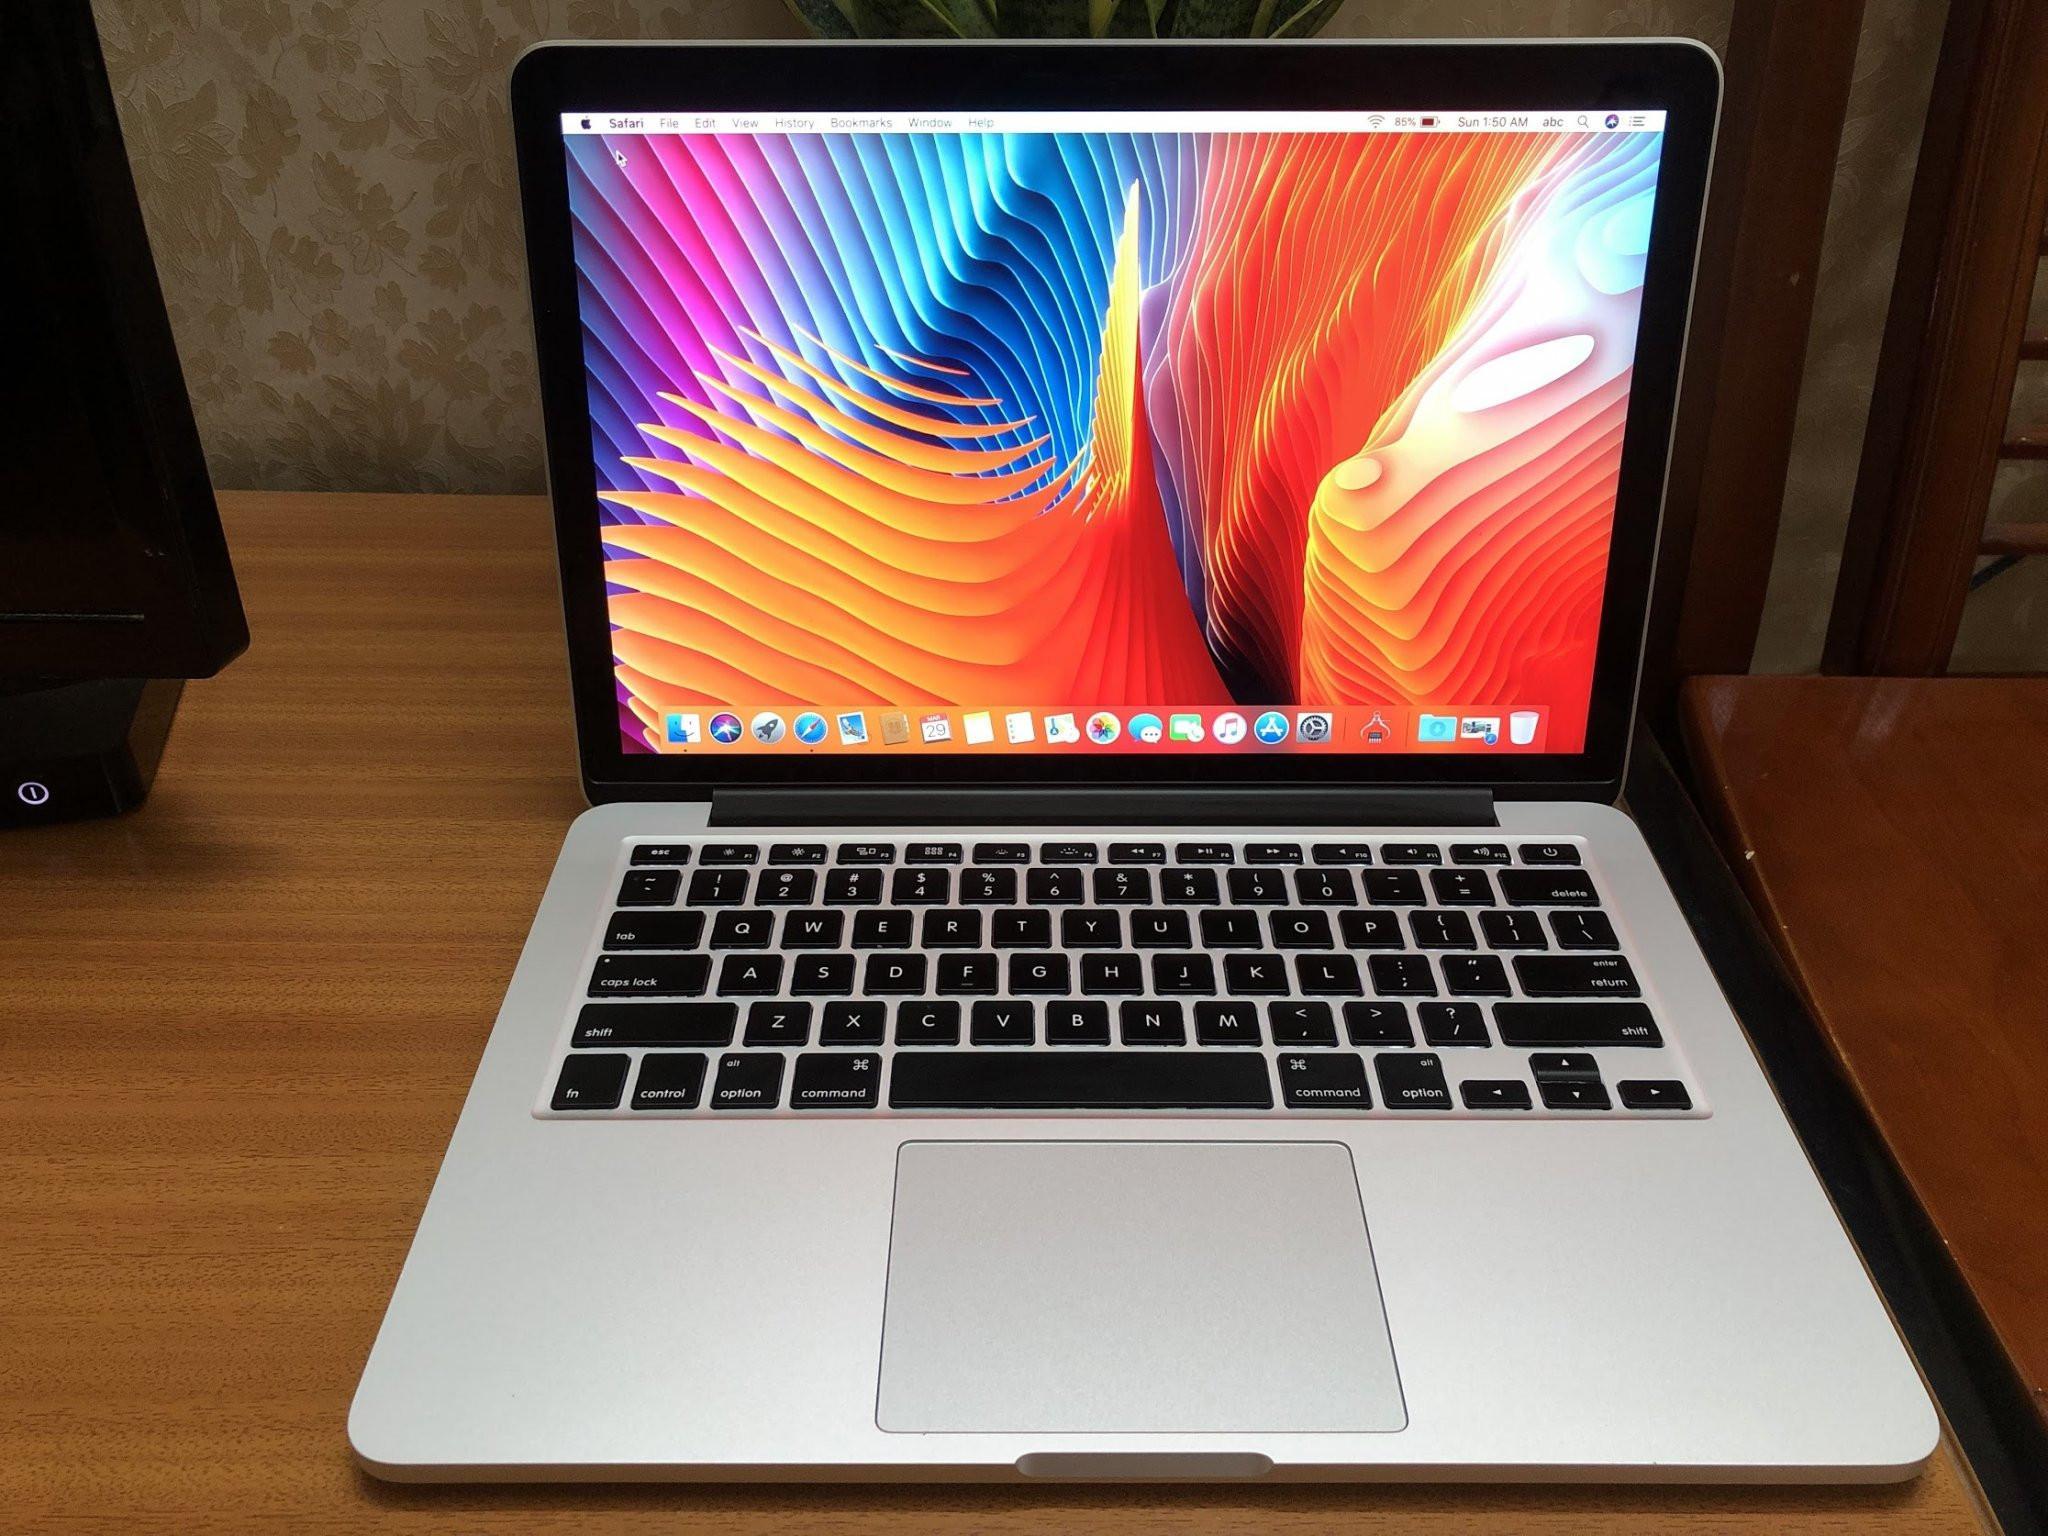 Macbook Pro 2015 13inch MF841, CoreI5 RAM8Gb 512